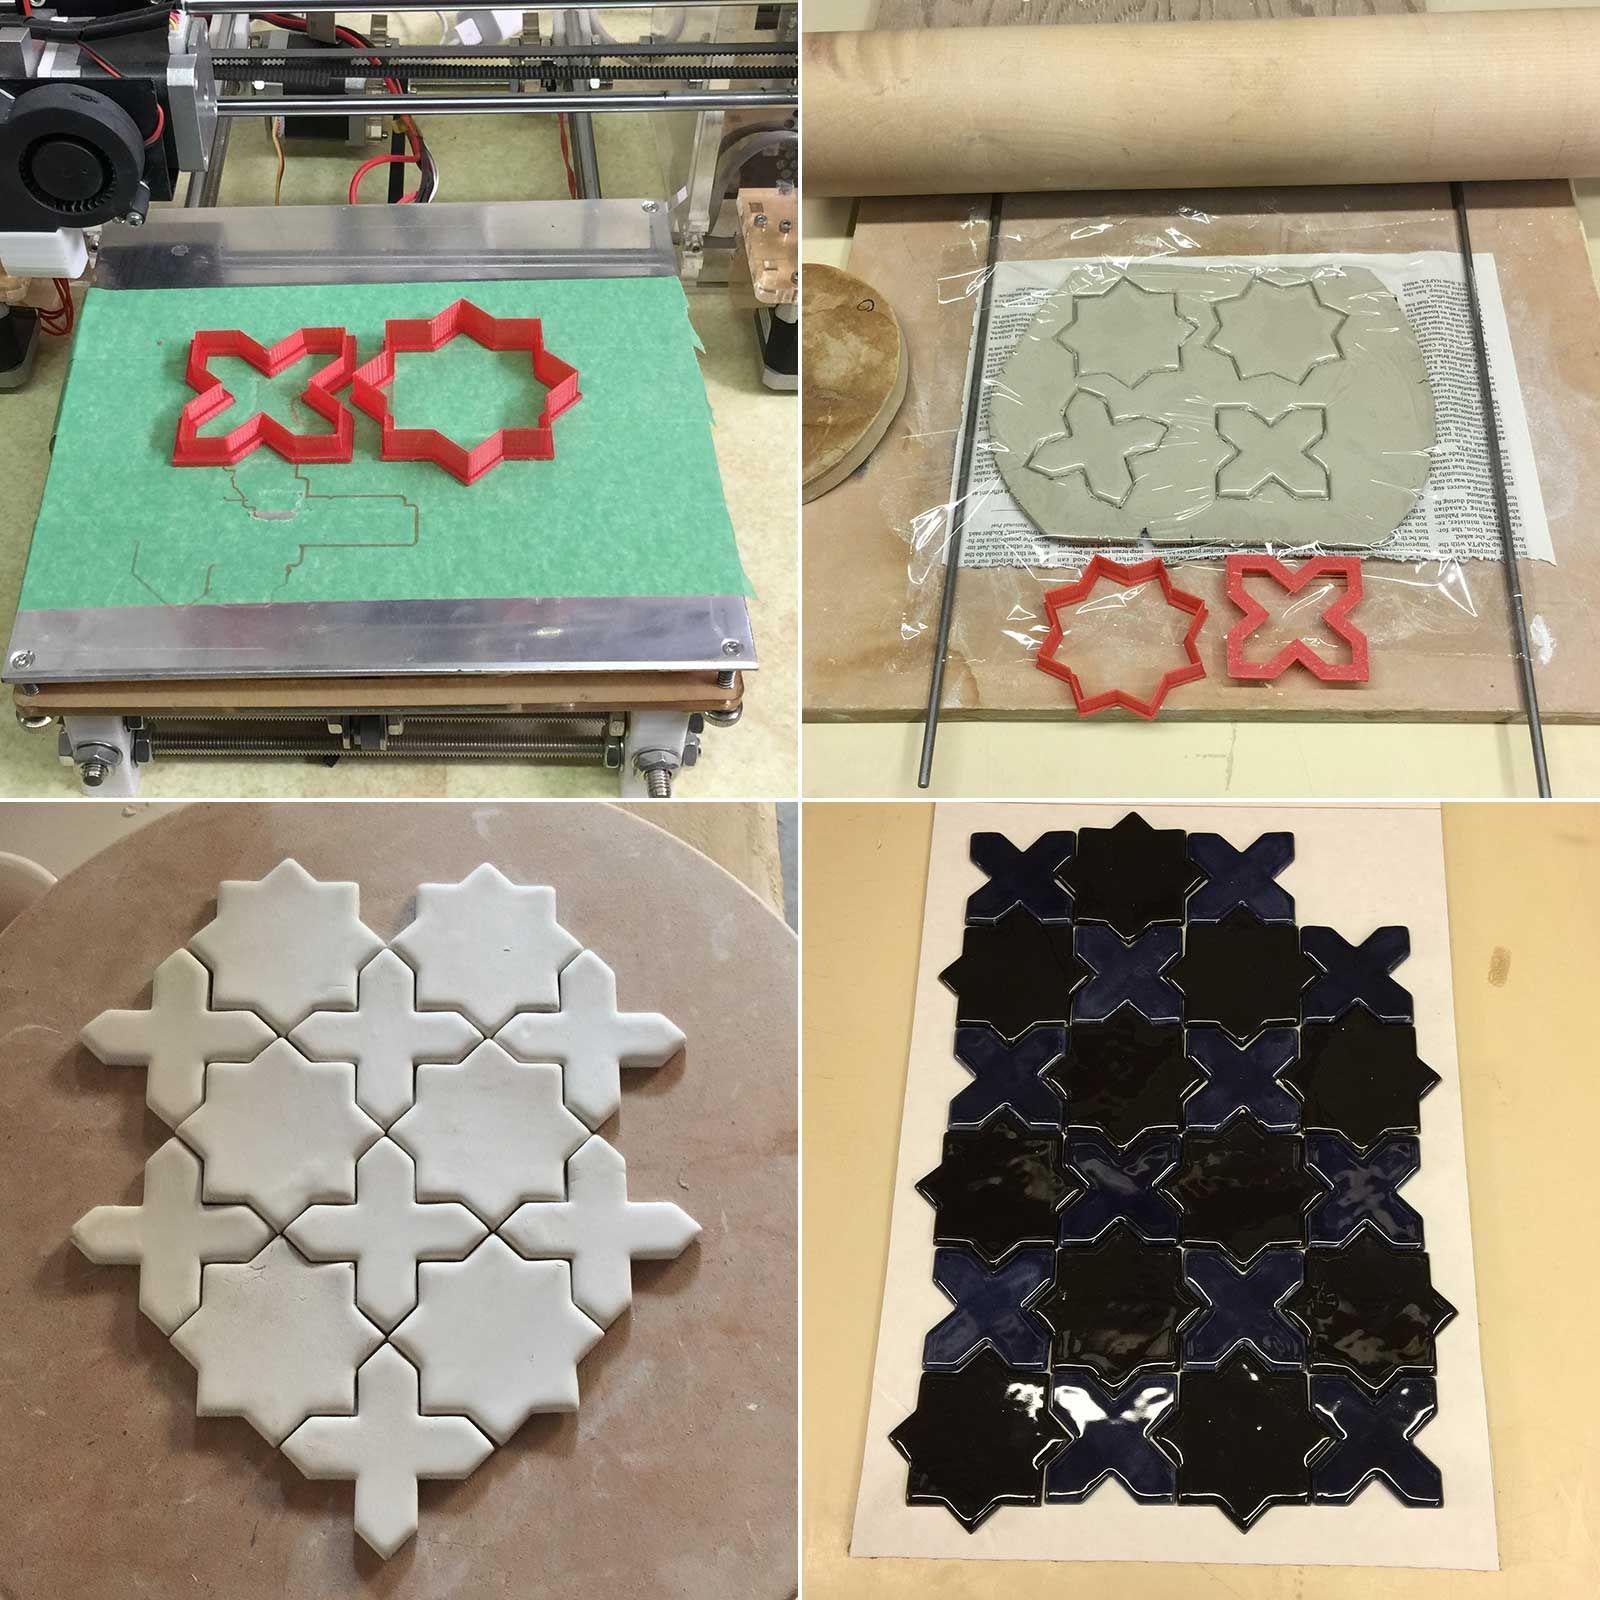 Great 12 X 24 Floor Tile Tall 12X12 Interlocking Ceiling Tiles Flat 18 X 18 Ceramic Tile 1930S Floor Tiles Reproduction Youthful 2 X2 Ceiling Tiles Coloured24X48 Ceiling Tiles Making Ceramic Tile Shapes By 3D Printing Your Own Cookie Cutters ..